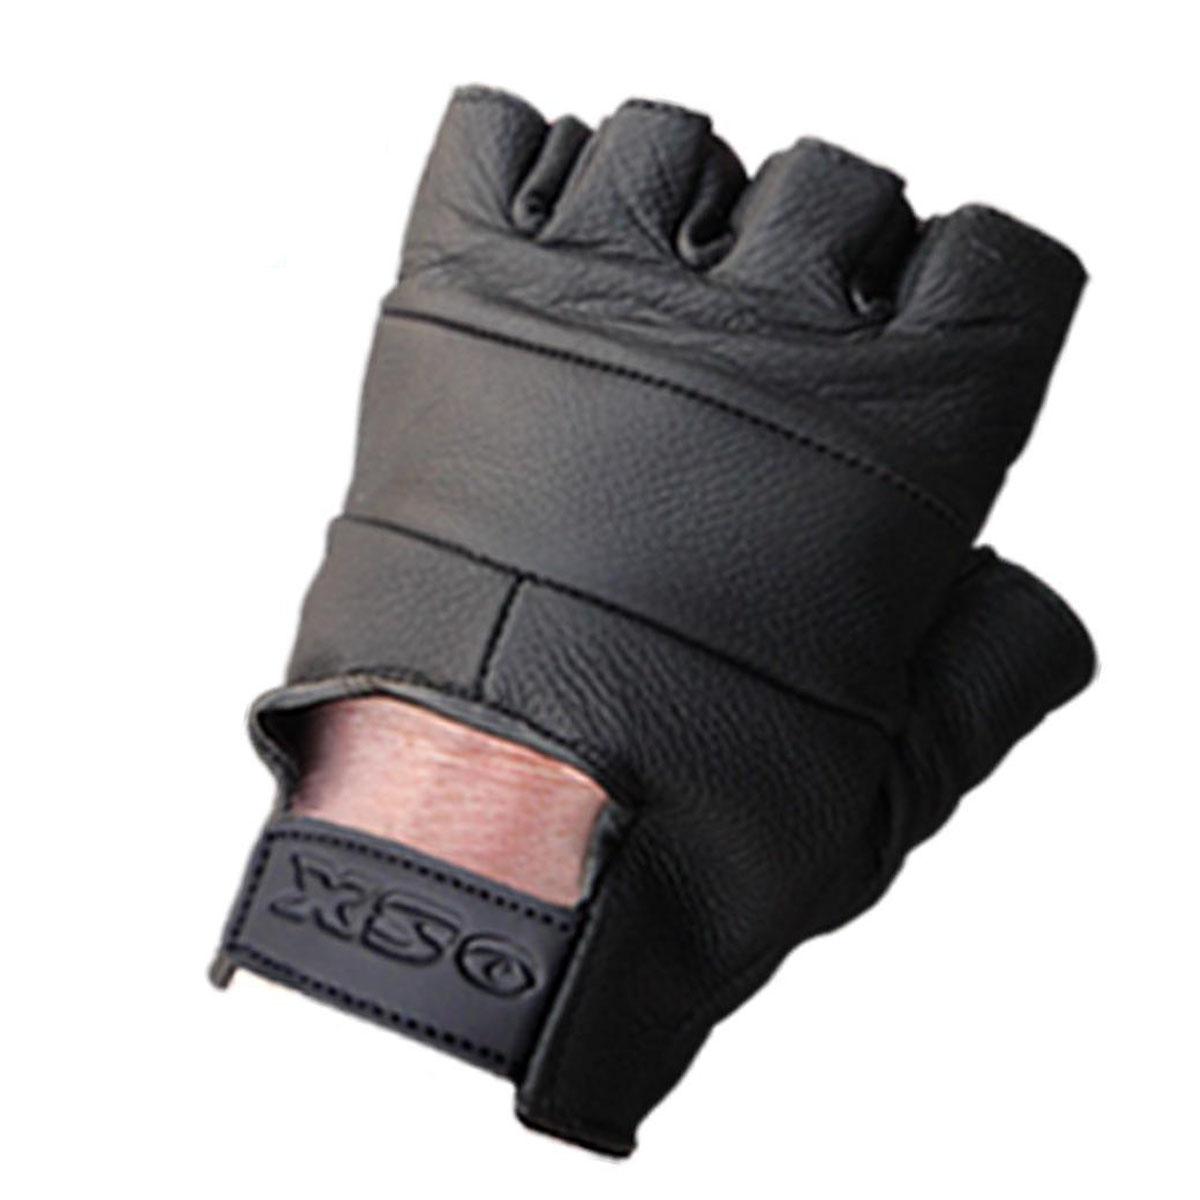 Weight Lifting Gloves Xxl: LEATHER FINGERLESS GLOVES BIKER DRIVING CYCLING WHEELCHAIR